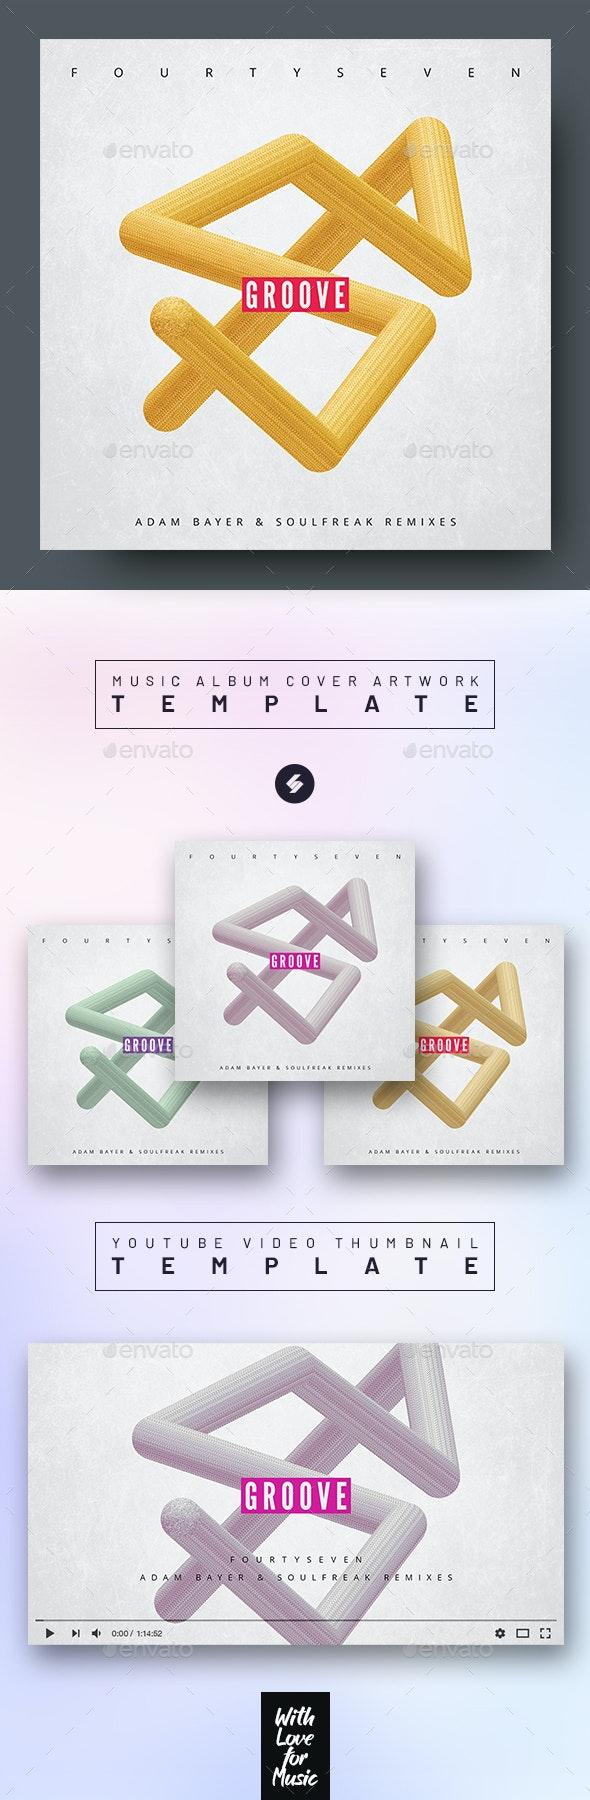 Groove – Music Album Cover Artwork Template - Miscellaneous Social Media